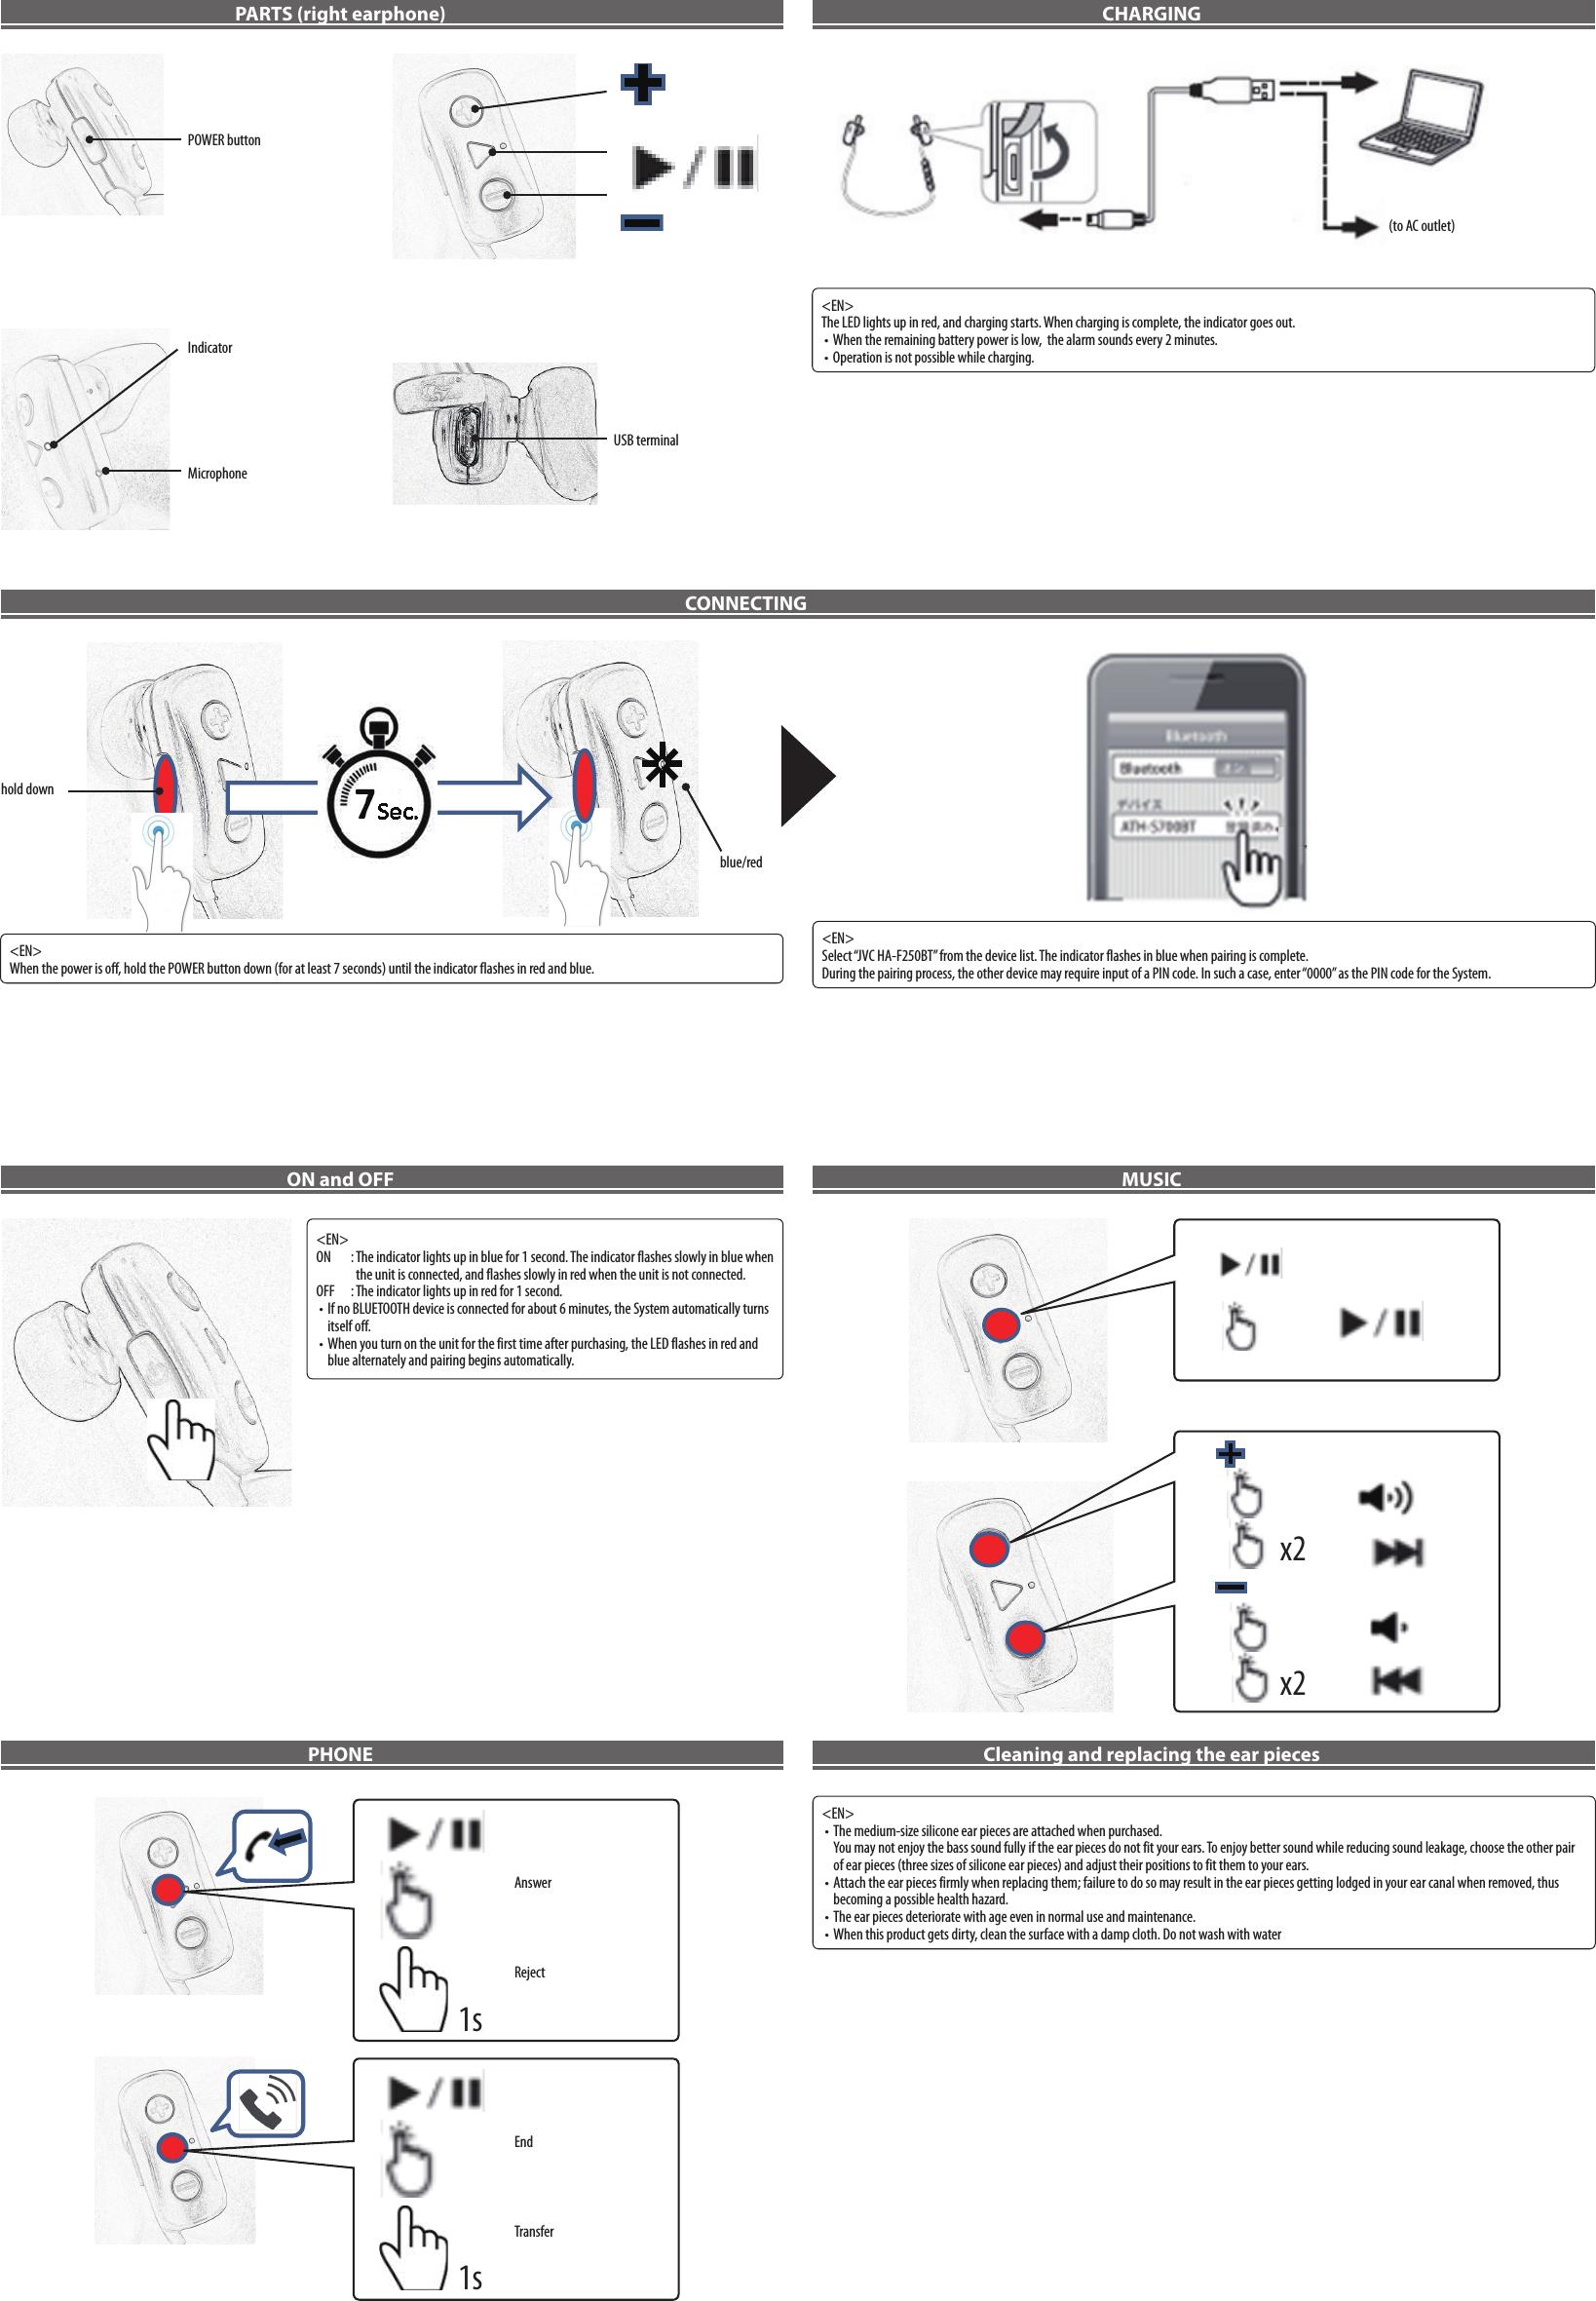 jaybird wireless earphone instruction manual